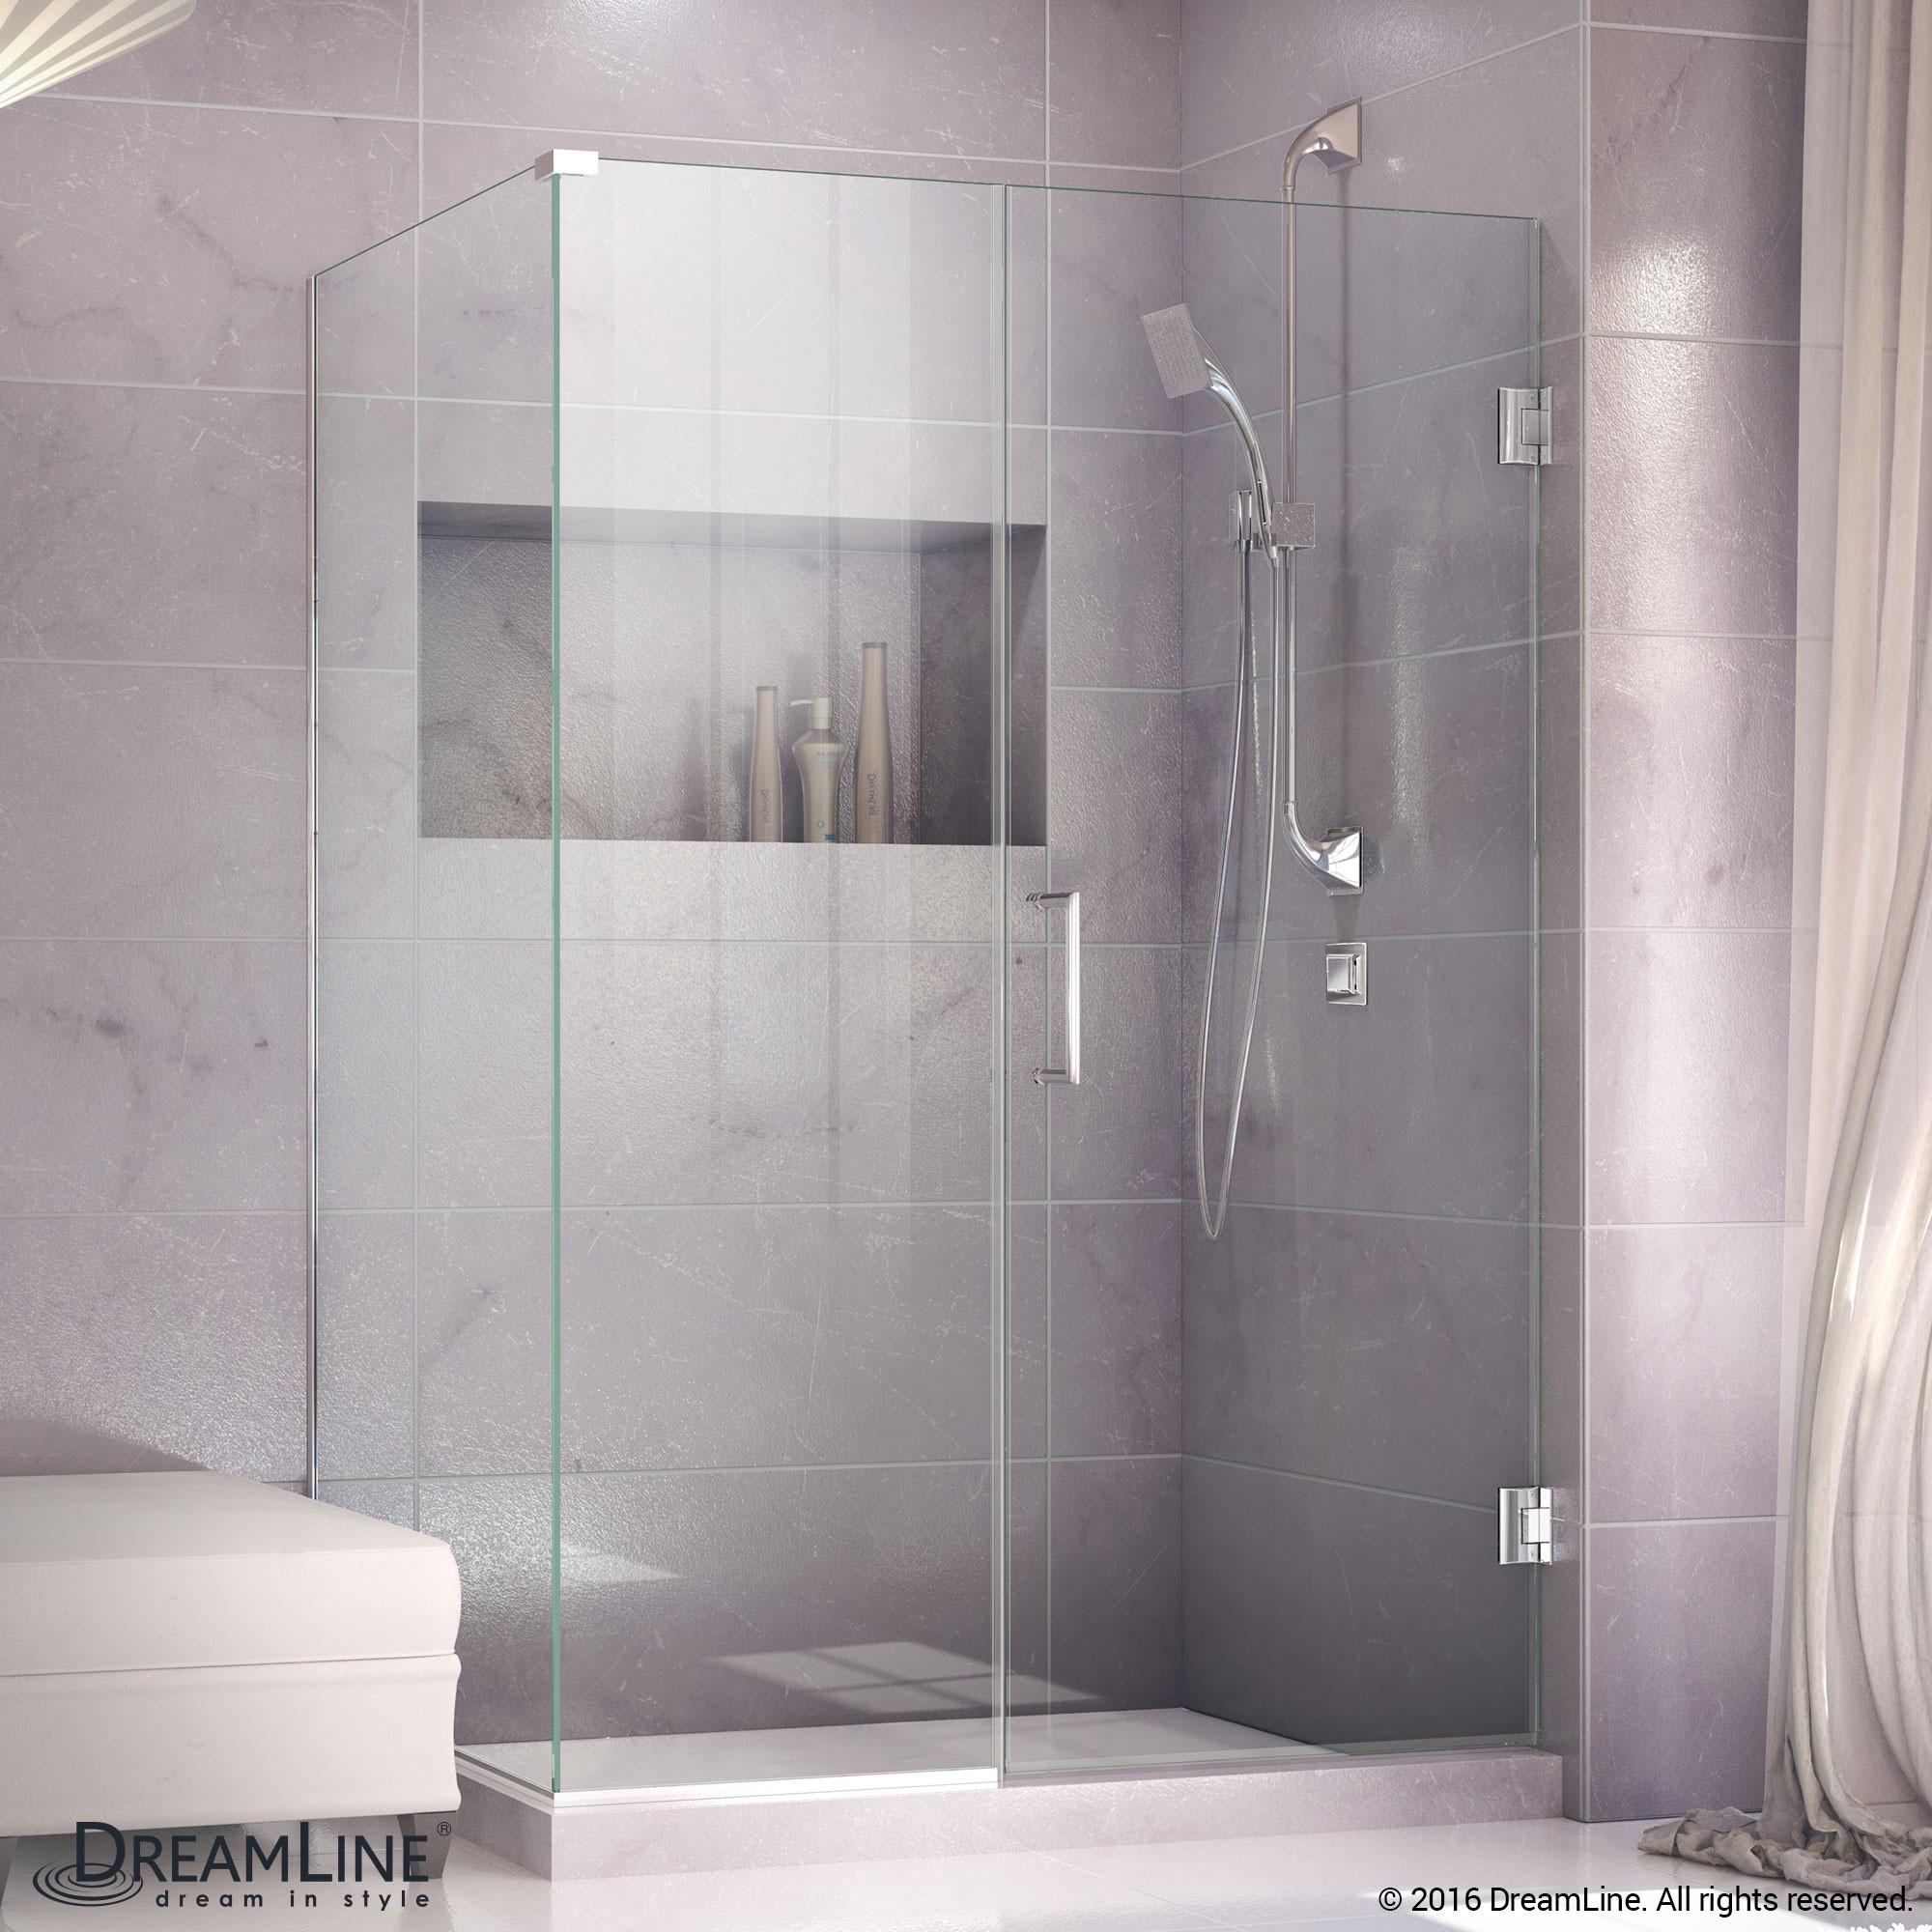 DreamLine SHEN-24300340-01 Unidoor Plus Hinged Shower Enclosure In Chrome Finish Hardware